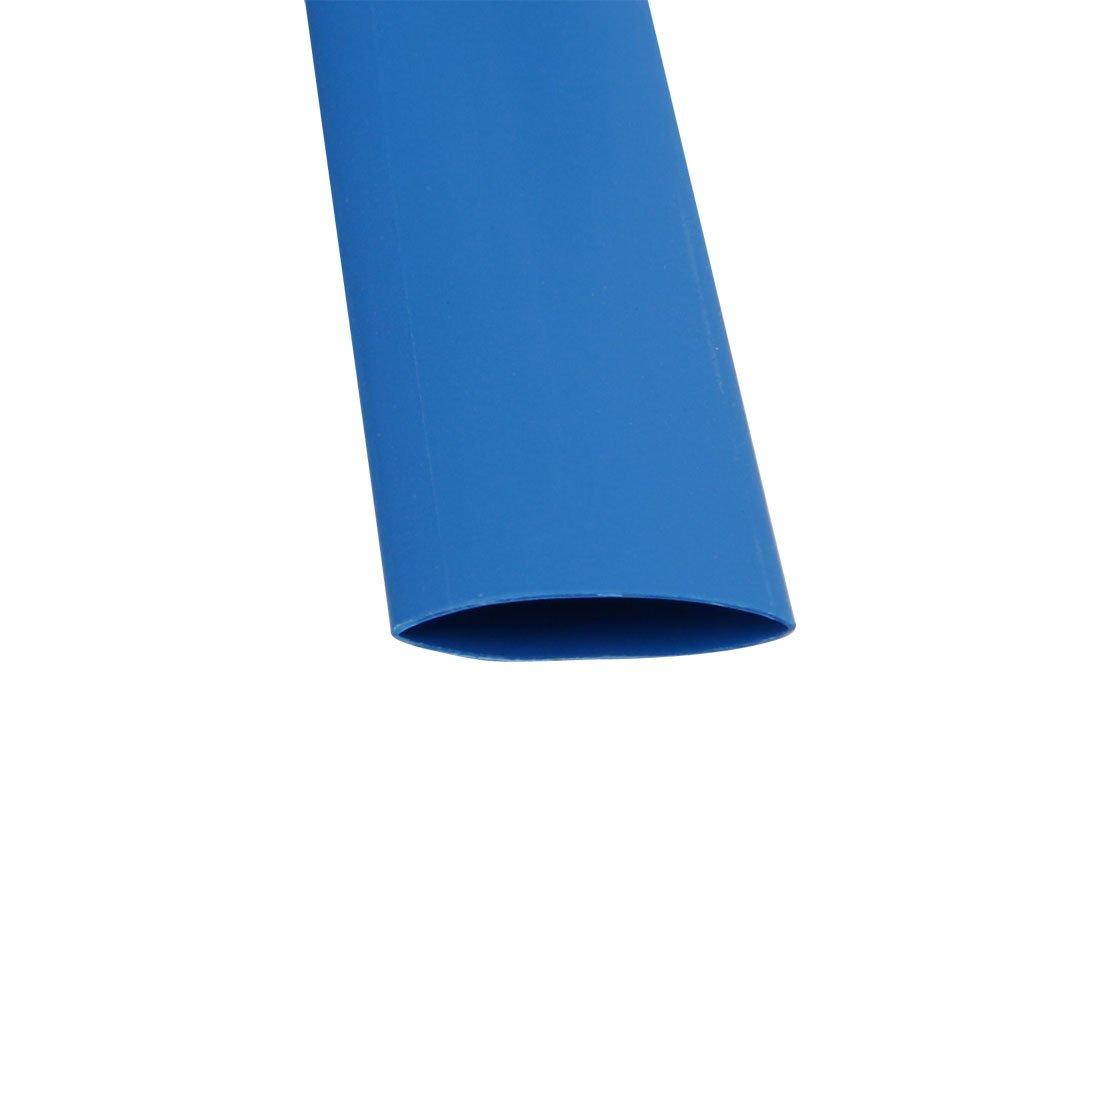 sourcing map Longitud 6.6Ft Tubo Termoretr/áctil de 8mm Di/ám Interior de Envoltura de Cable con Aislamiento de Poliolefina Azul